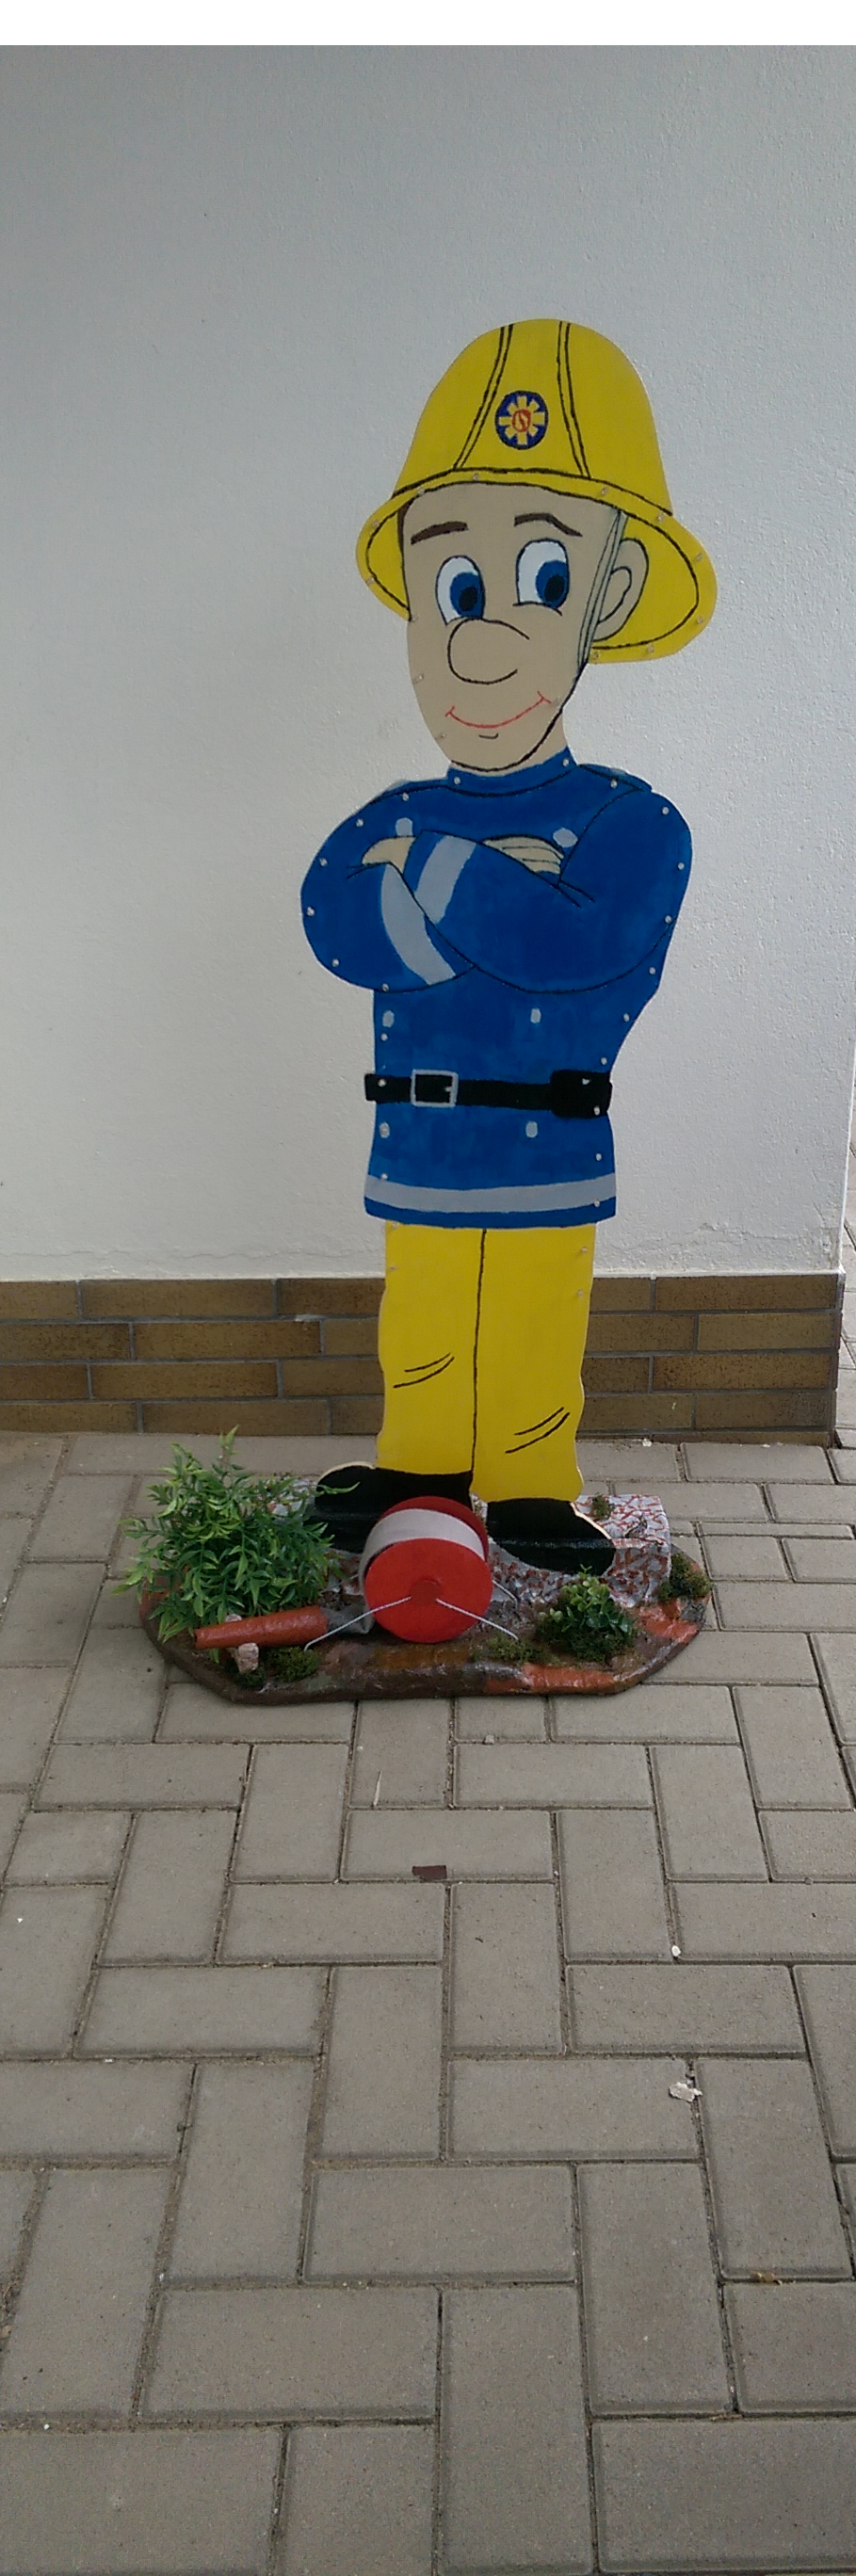 Feuerwehrmann Sam Feuerwehrmann Sam Feuerwehrmann Basteln